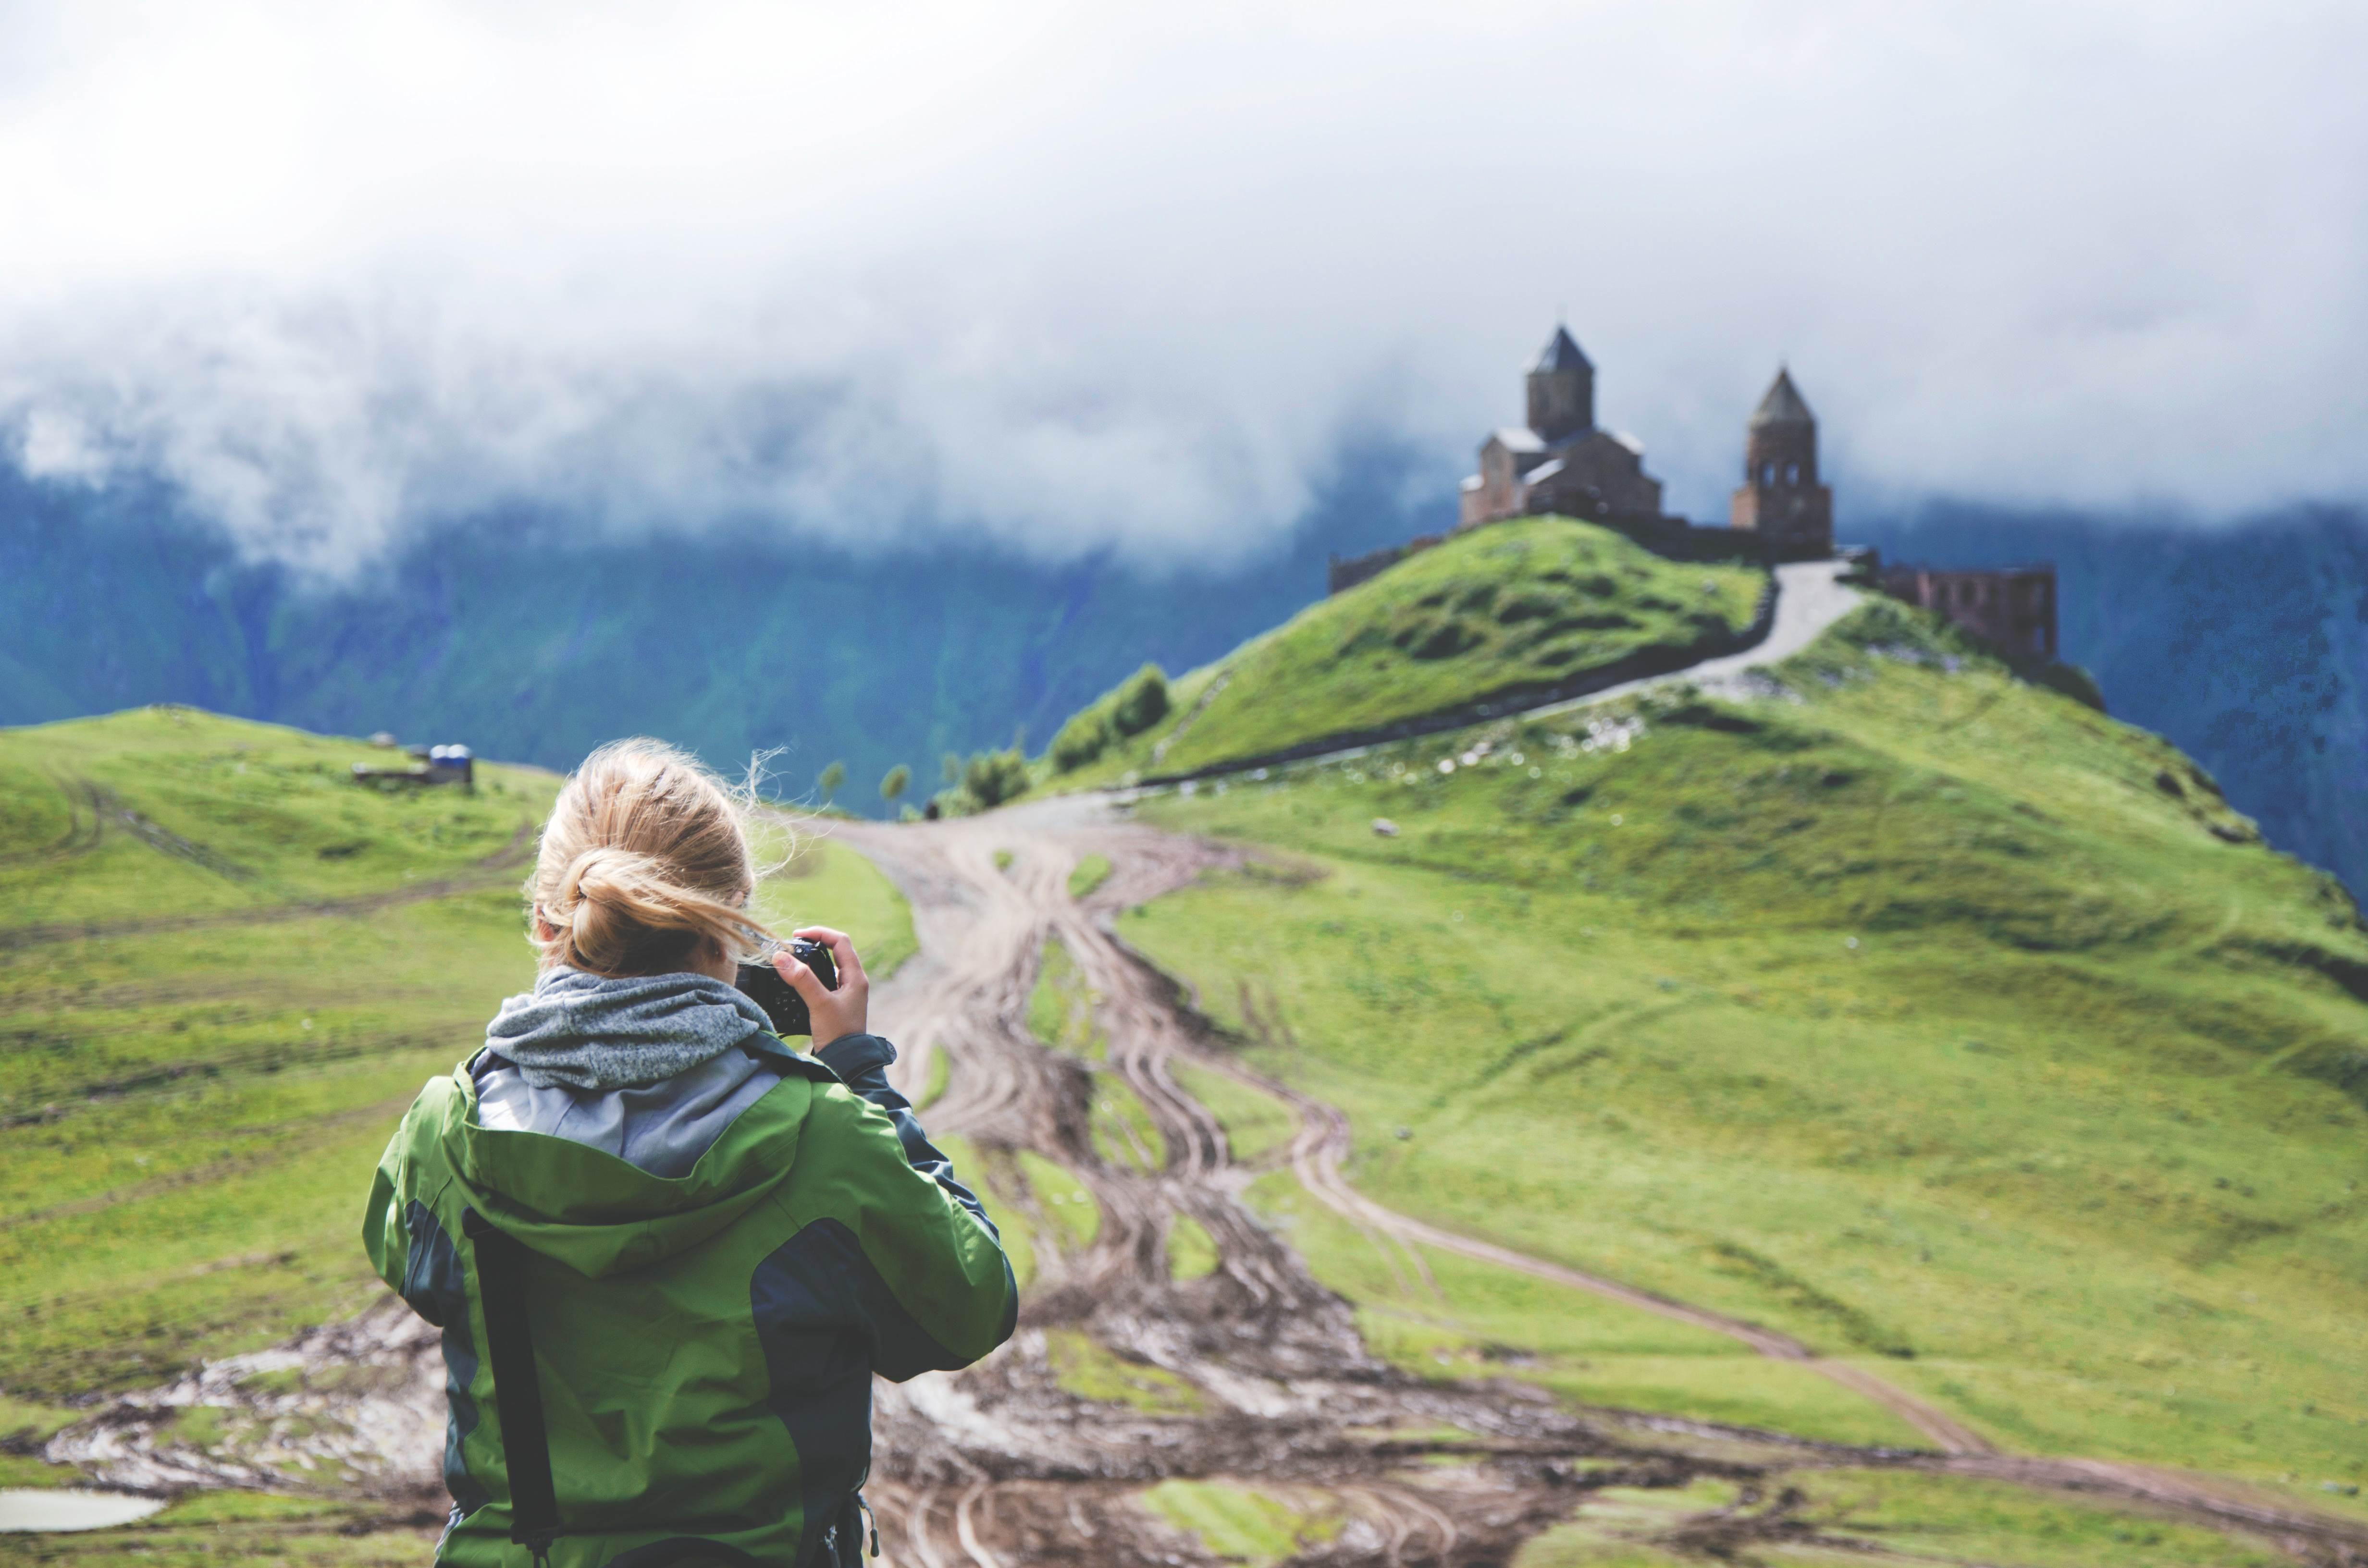 7 Ways How myLike Can Change The Way You Organize